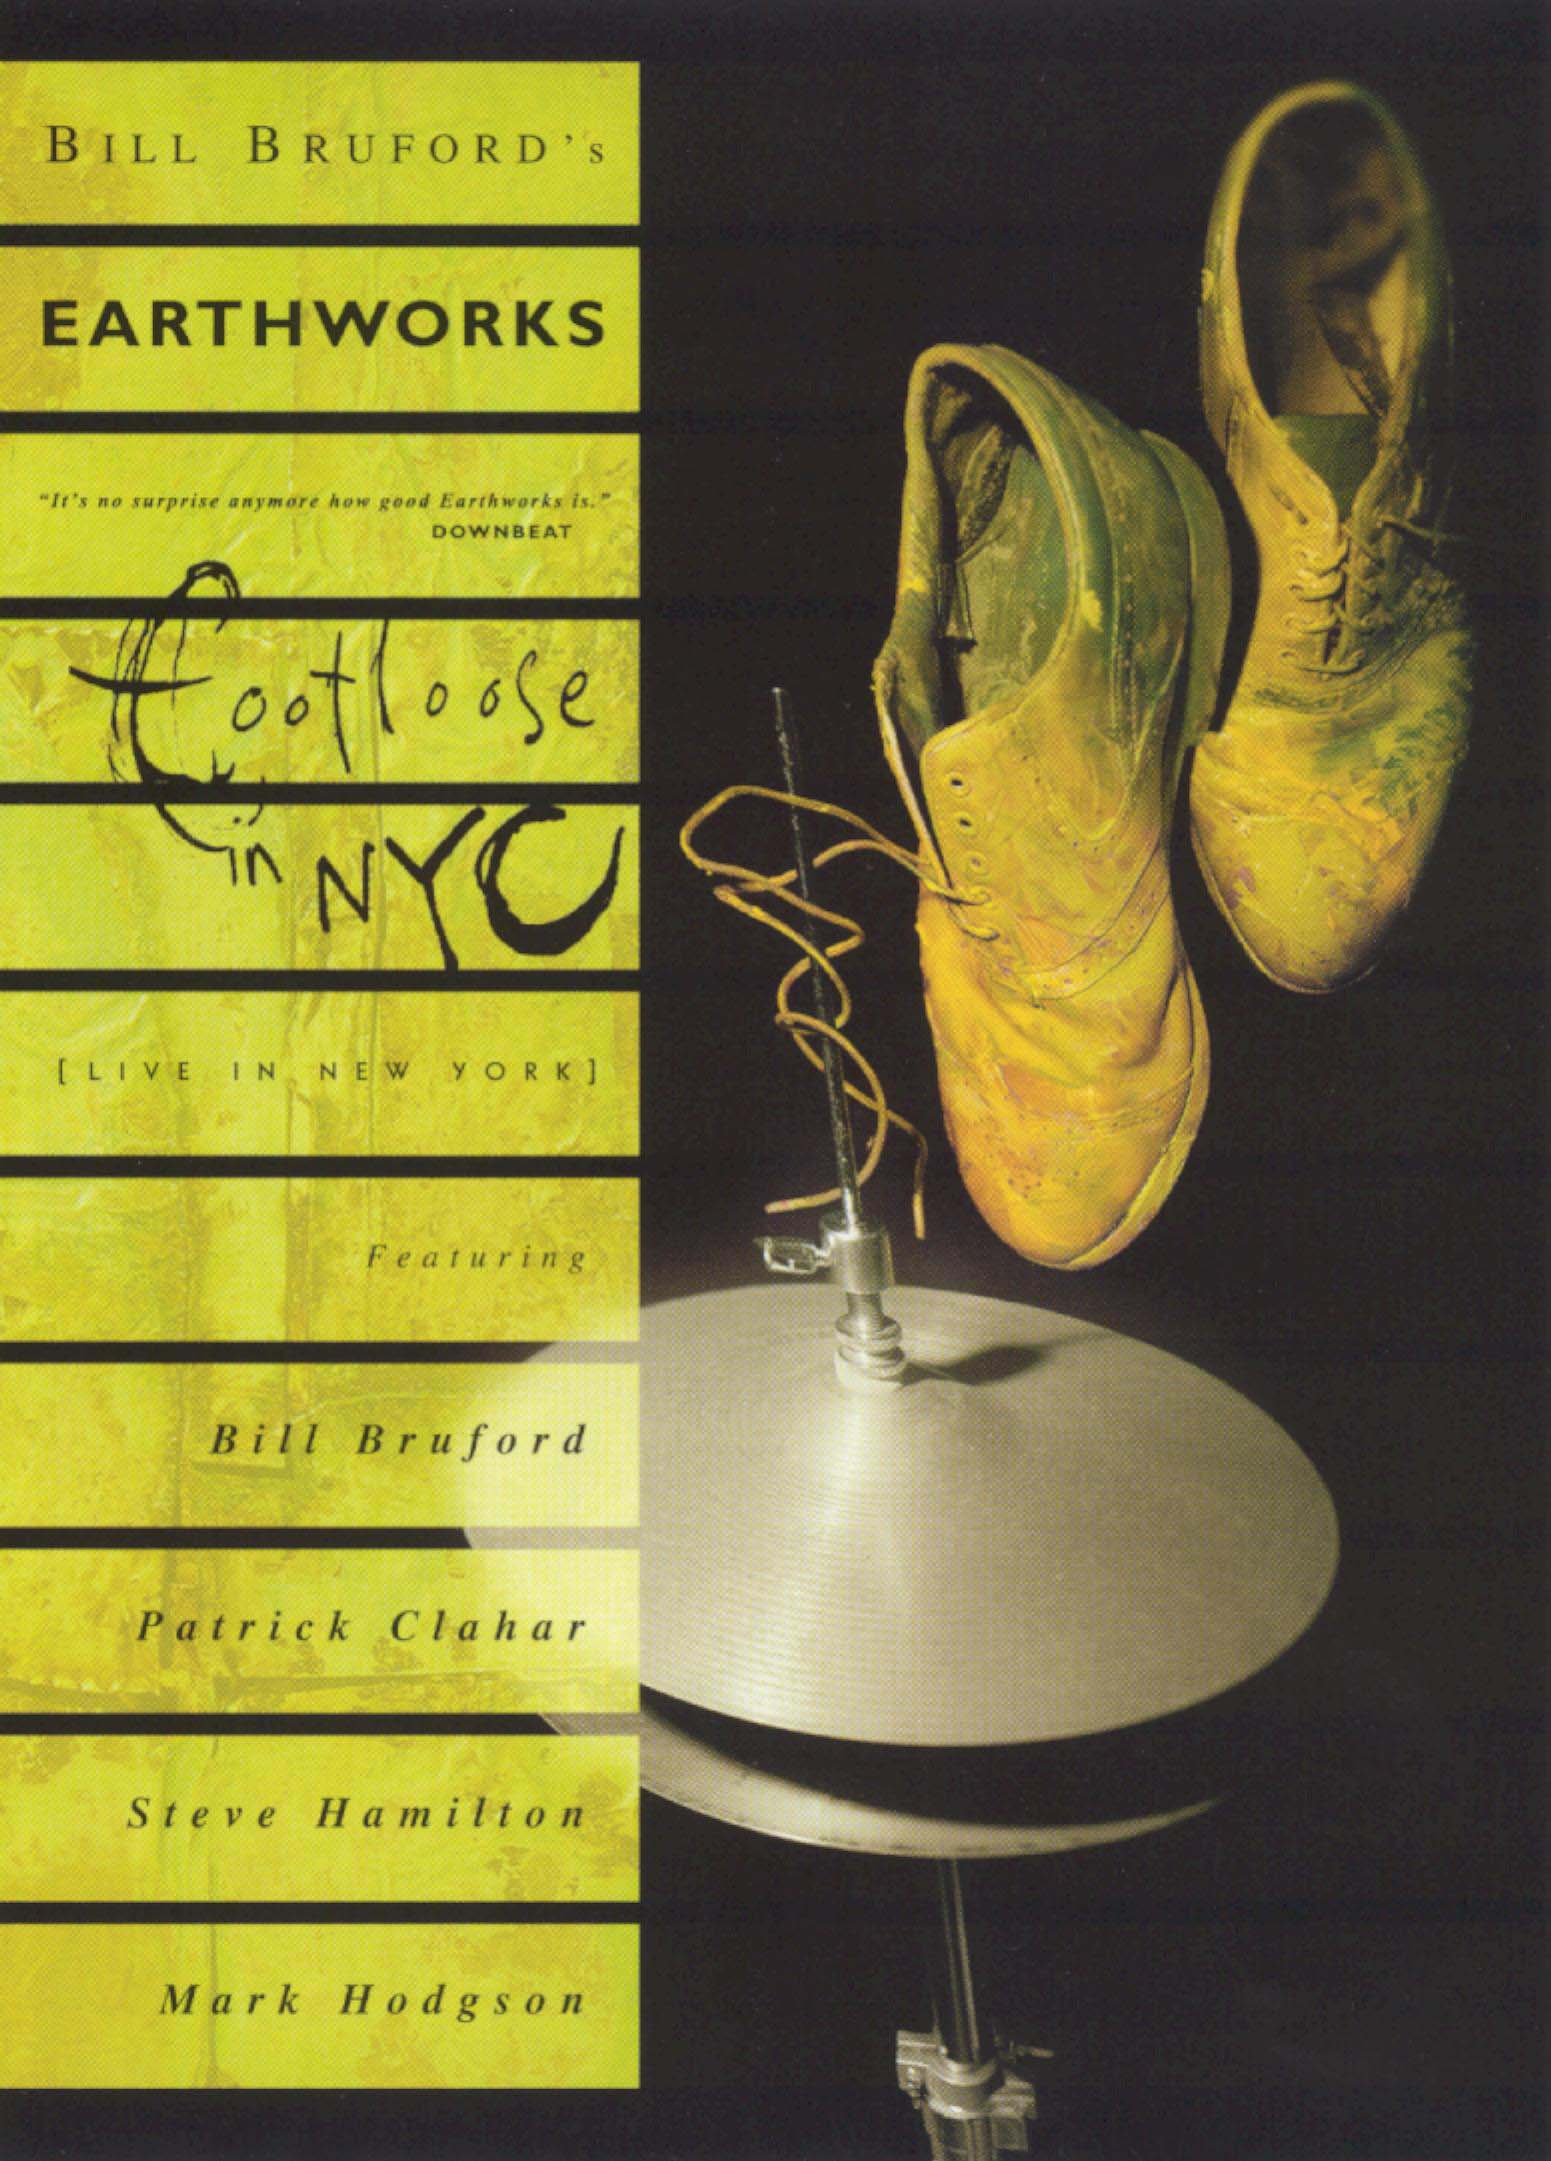 Bill Bruford: Footloose in New York City